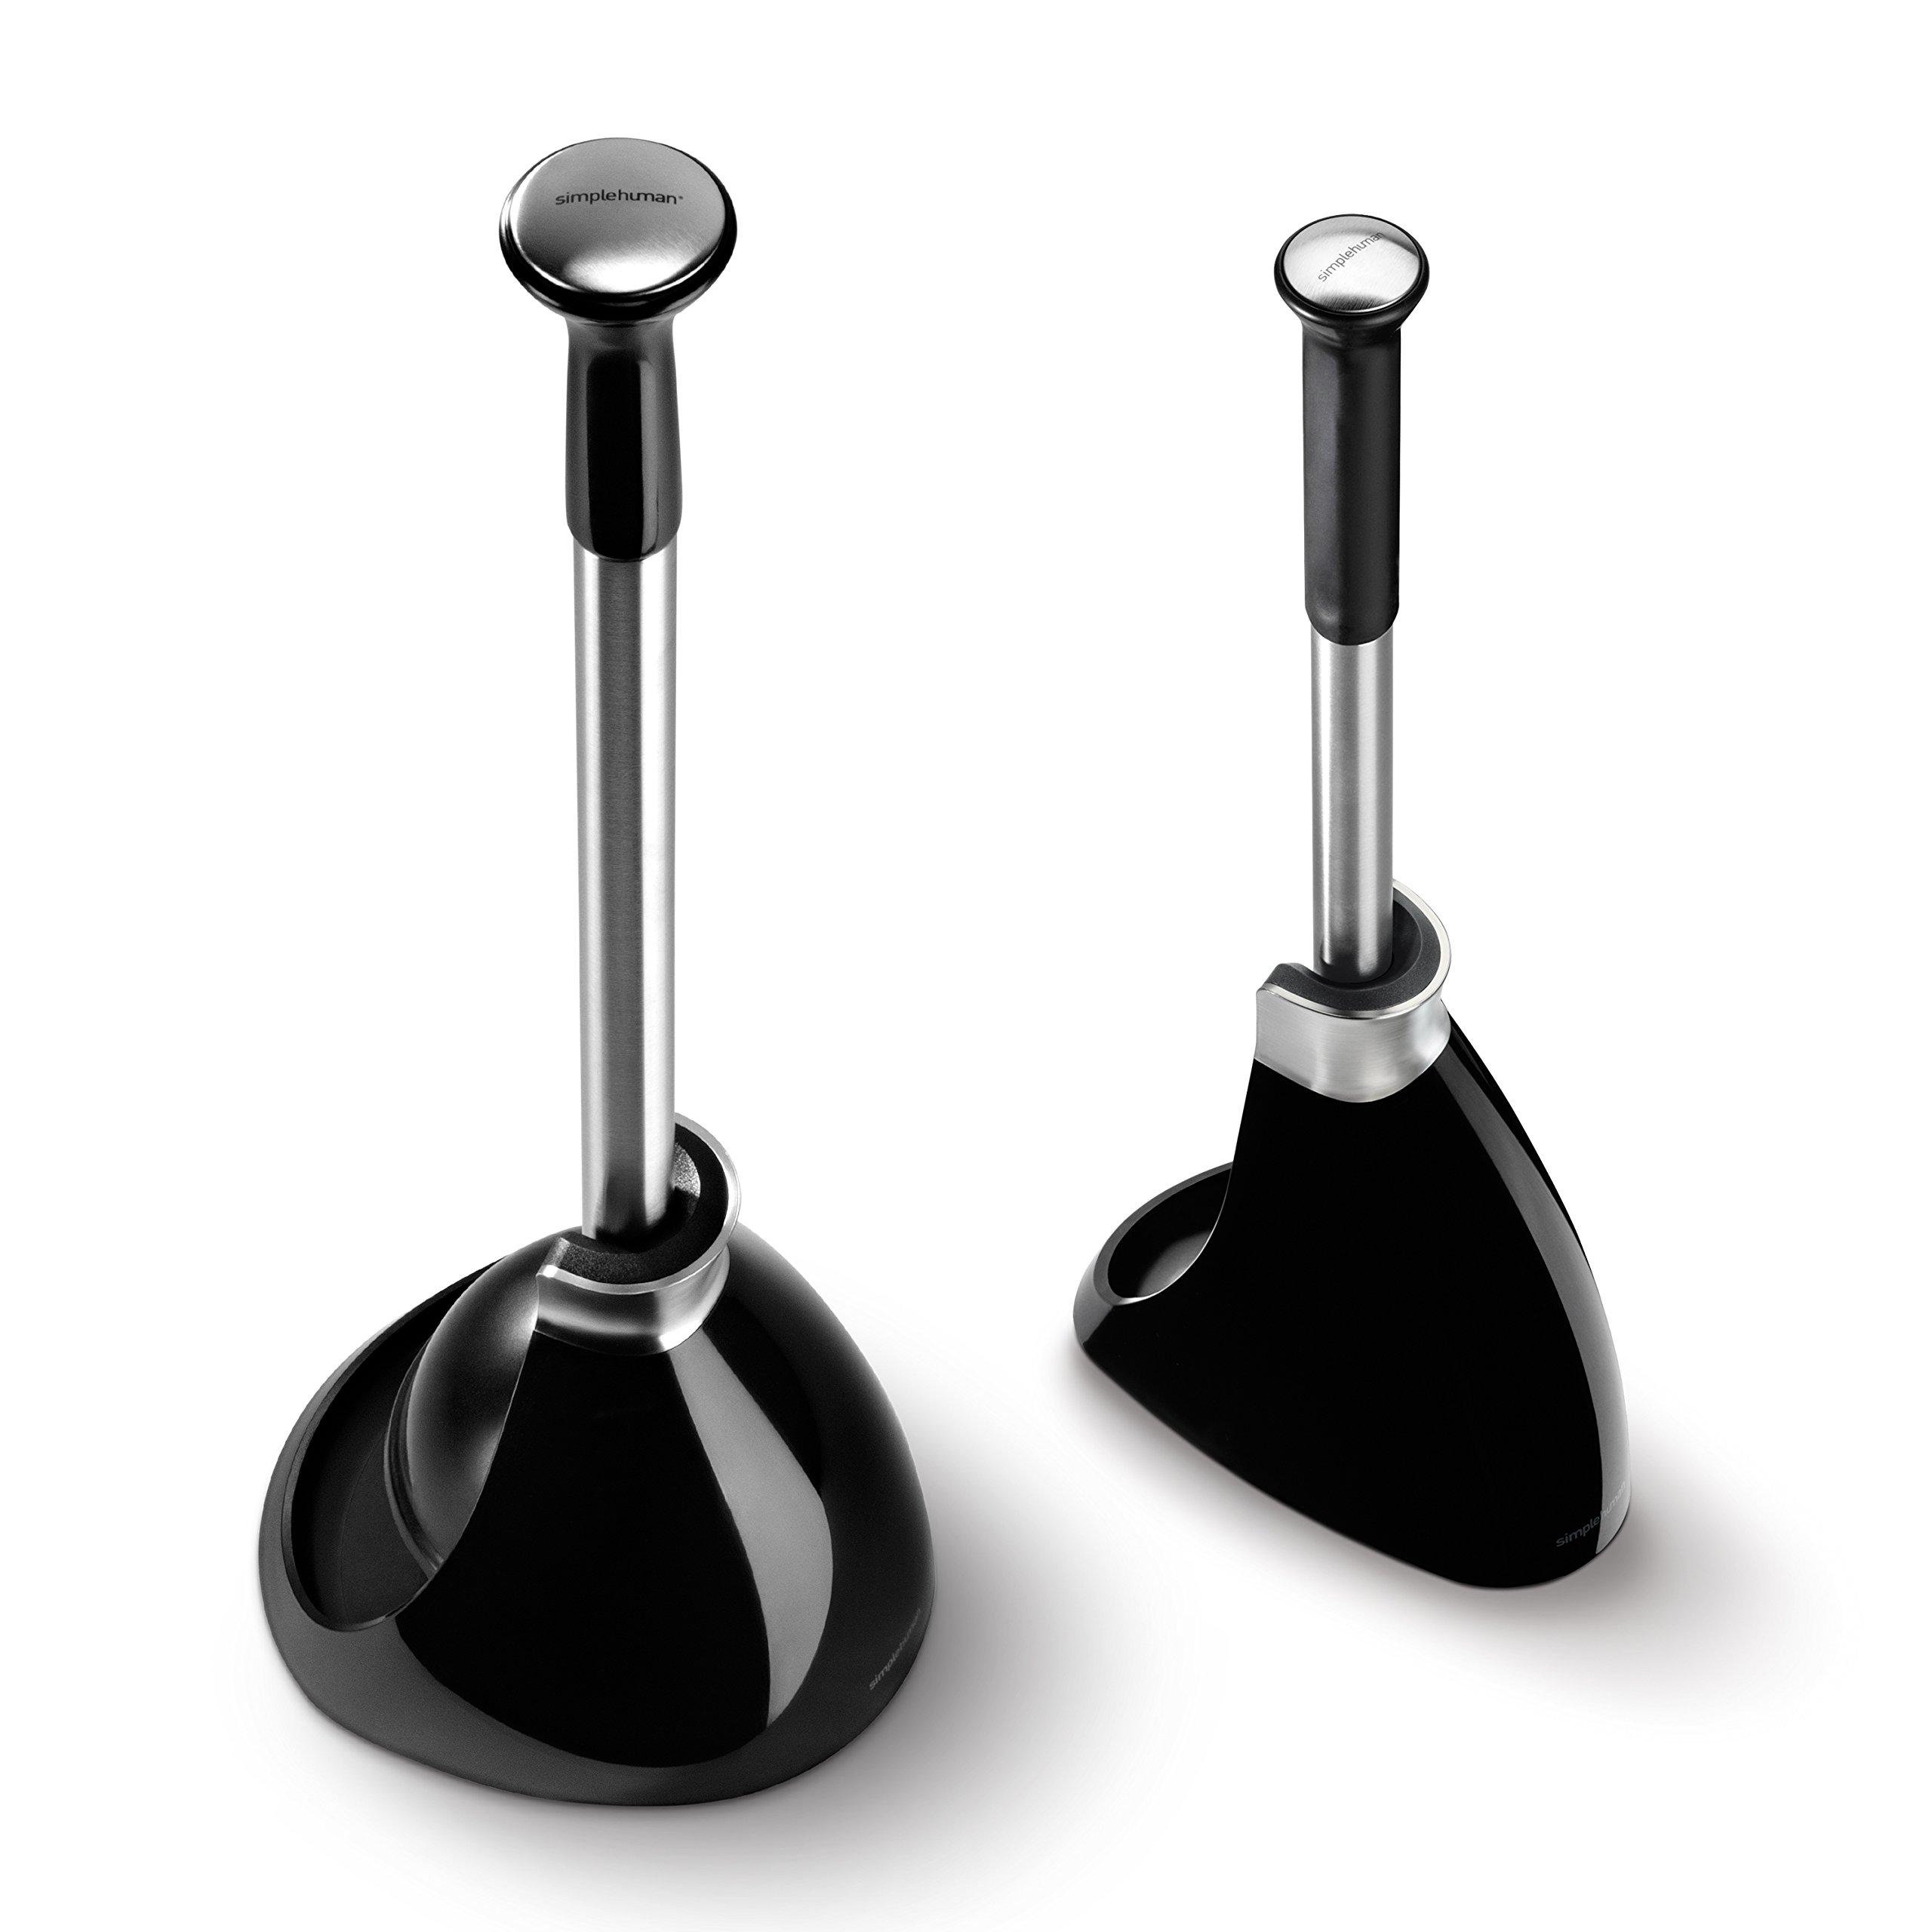 simplehuman toilet brush and toilet plunger set black